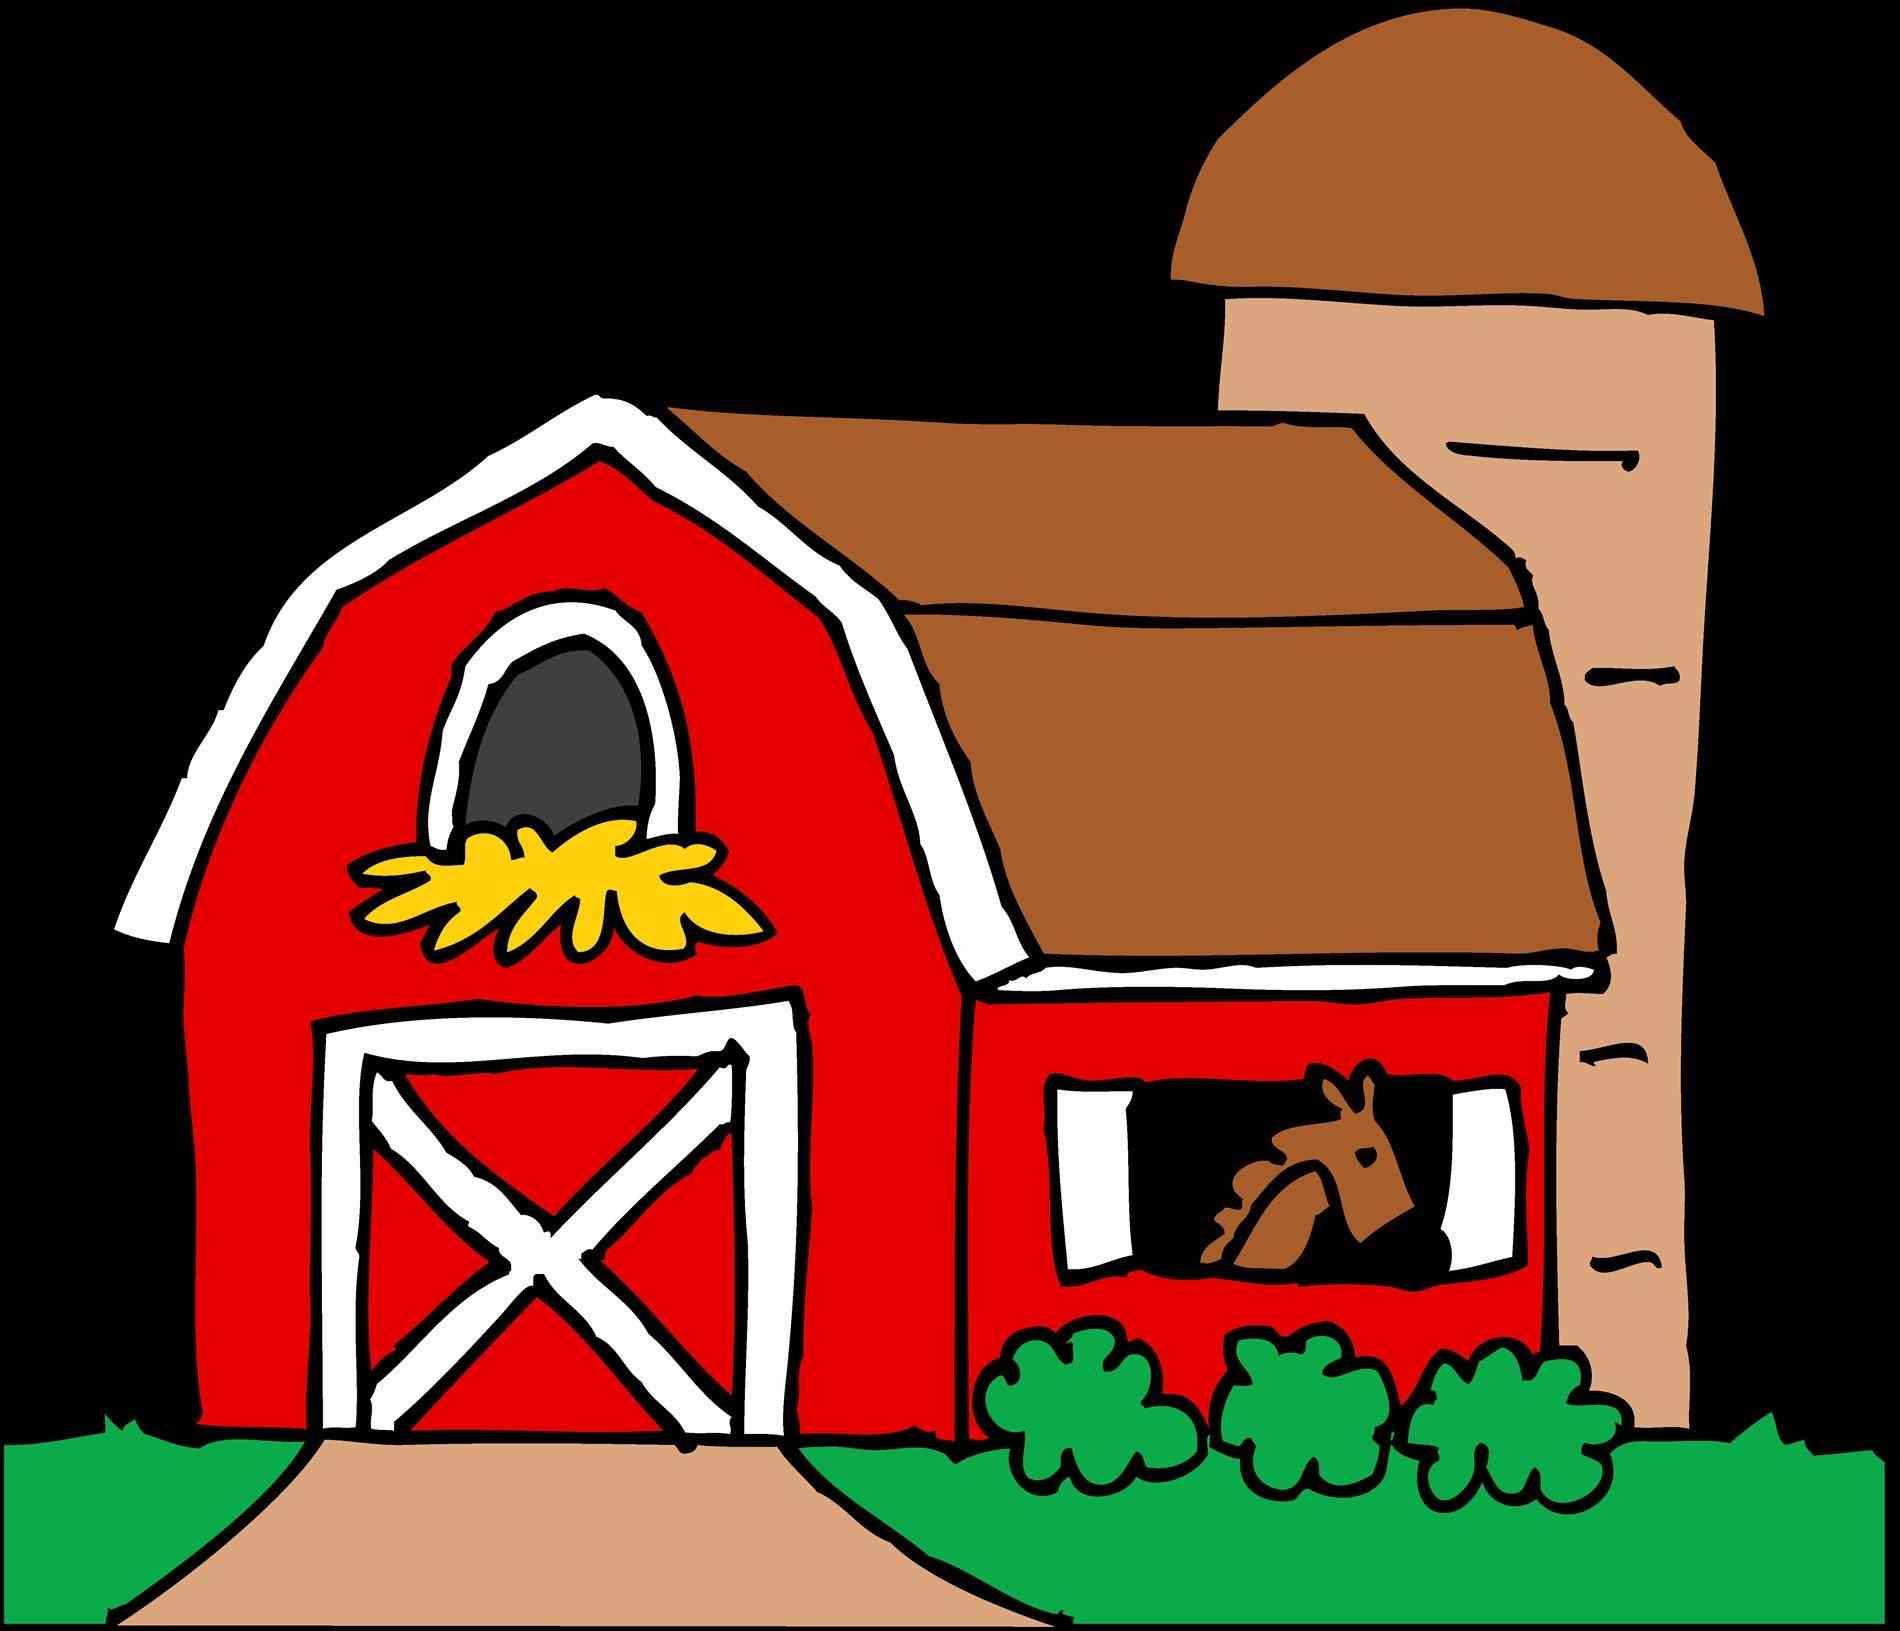 1900x1631 Red Farmhouse Clipart Cute Farm With Barn And Silo Free Clip Art